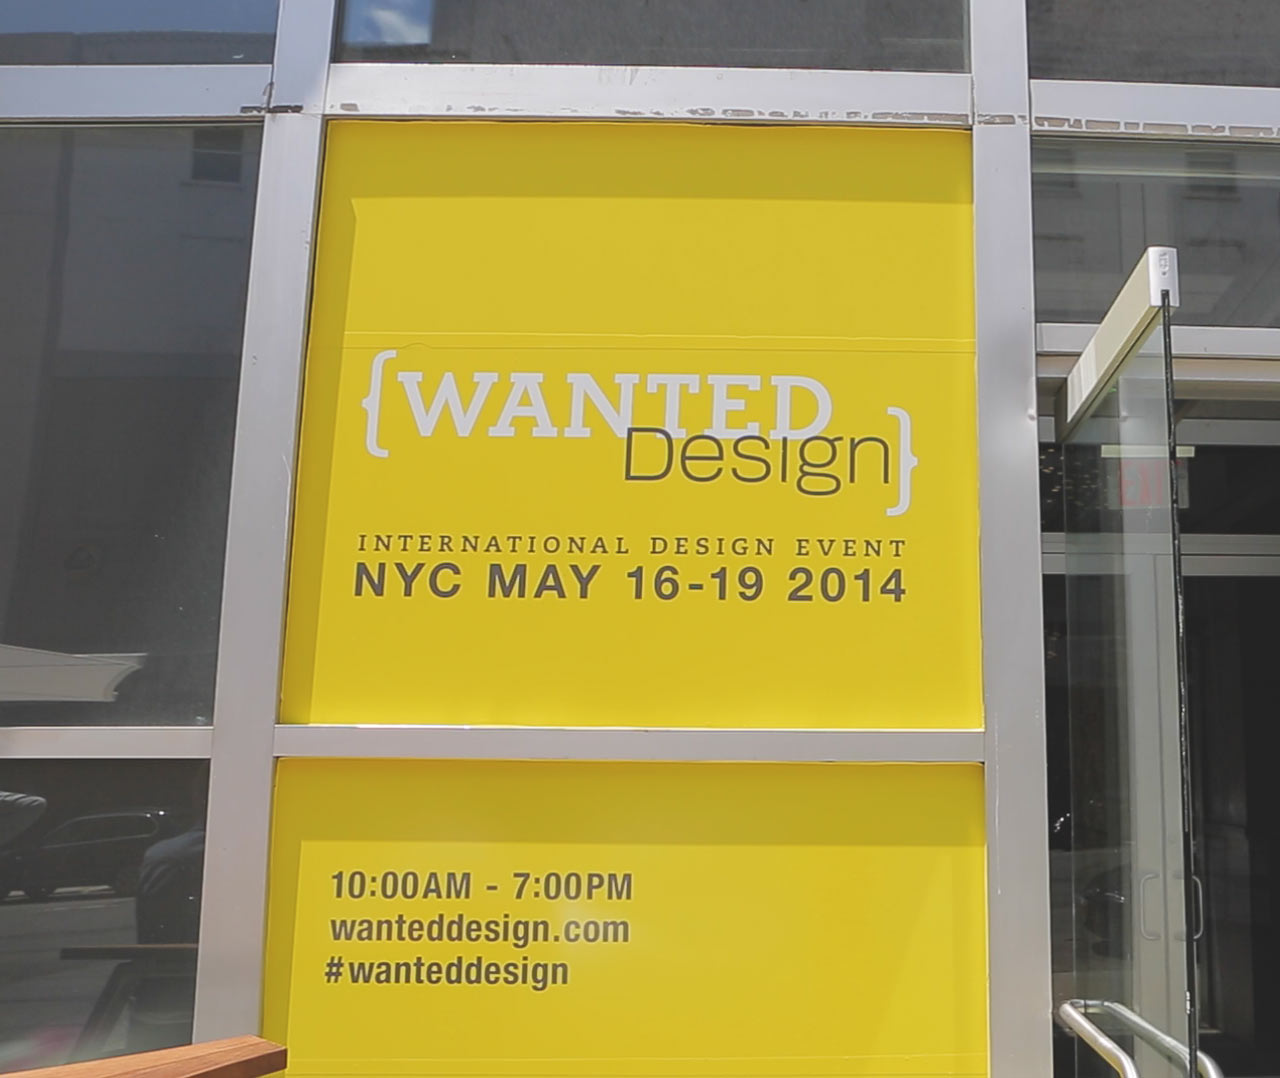 A Look at WantedDesign 2014